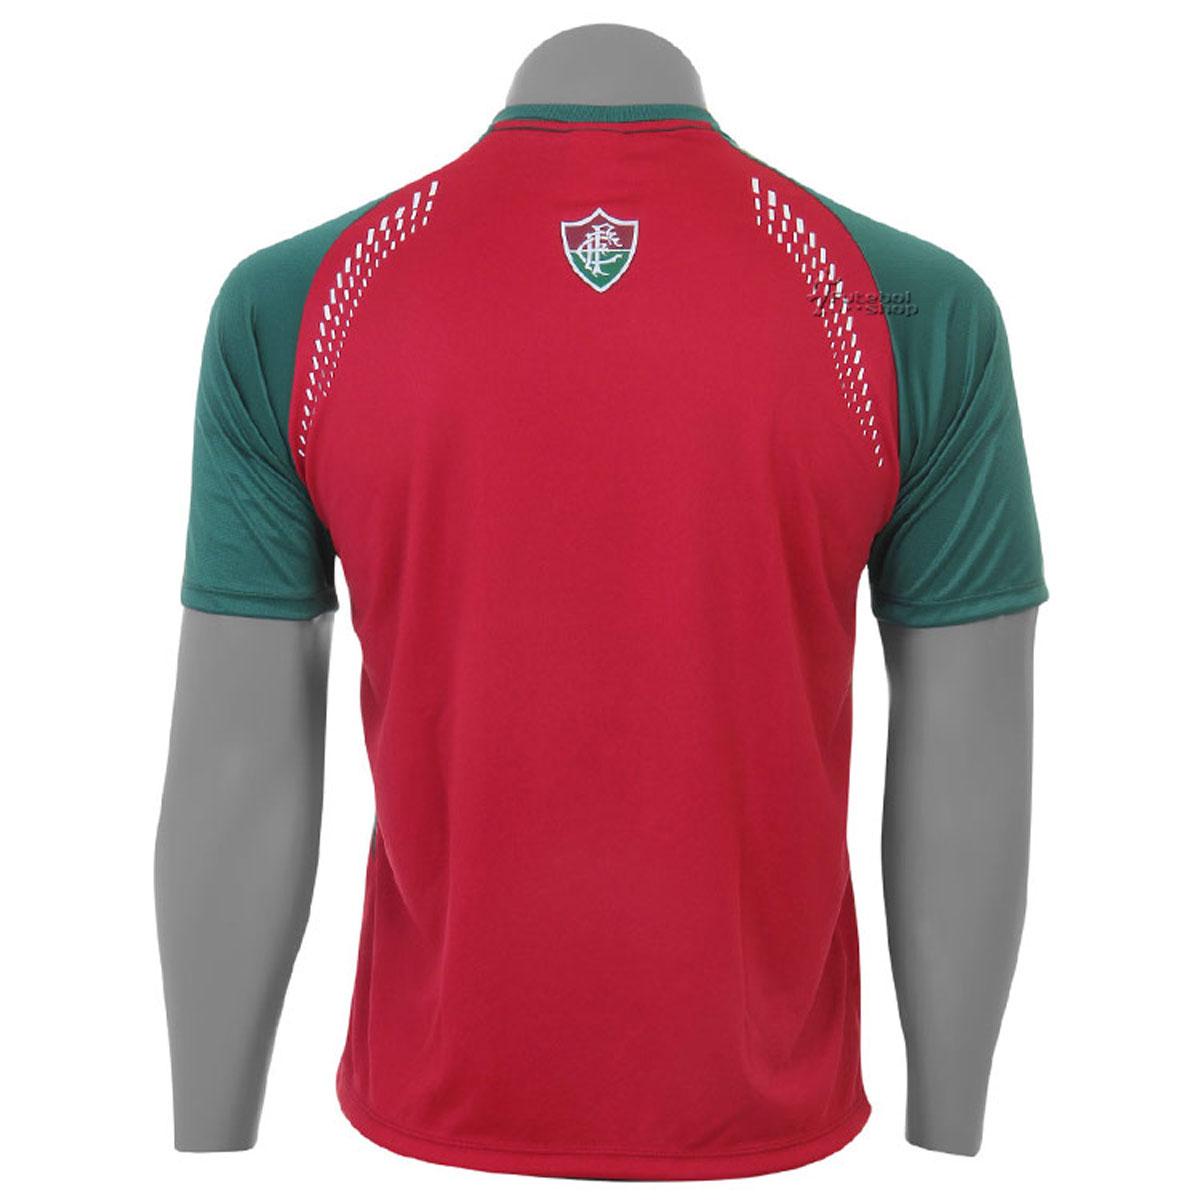 Camisa do Fluminense Braziline Trop fb79a6a35d1f7